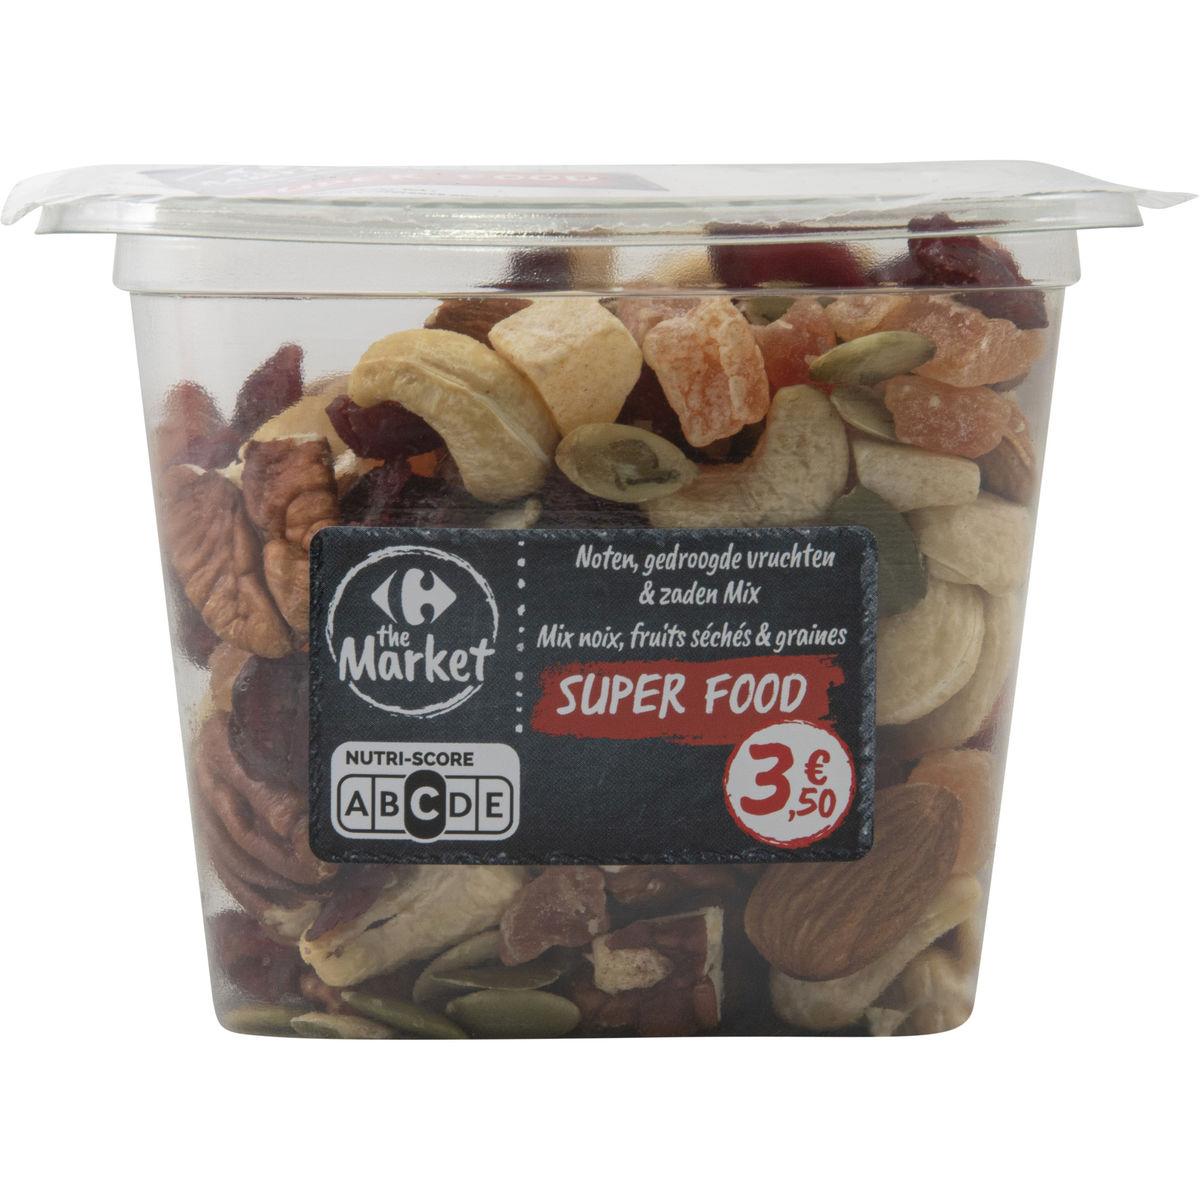 Carrefour Super Food Nuts & Fruits Mix Noix, Fruits & Graines 200 g